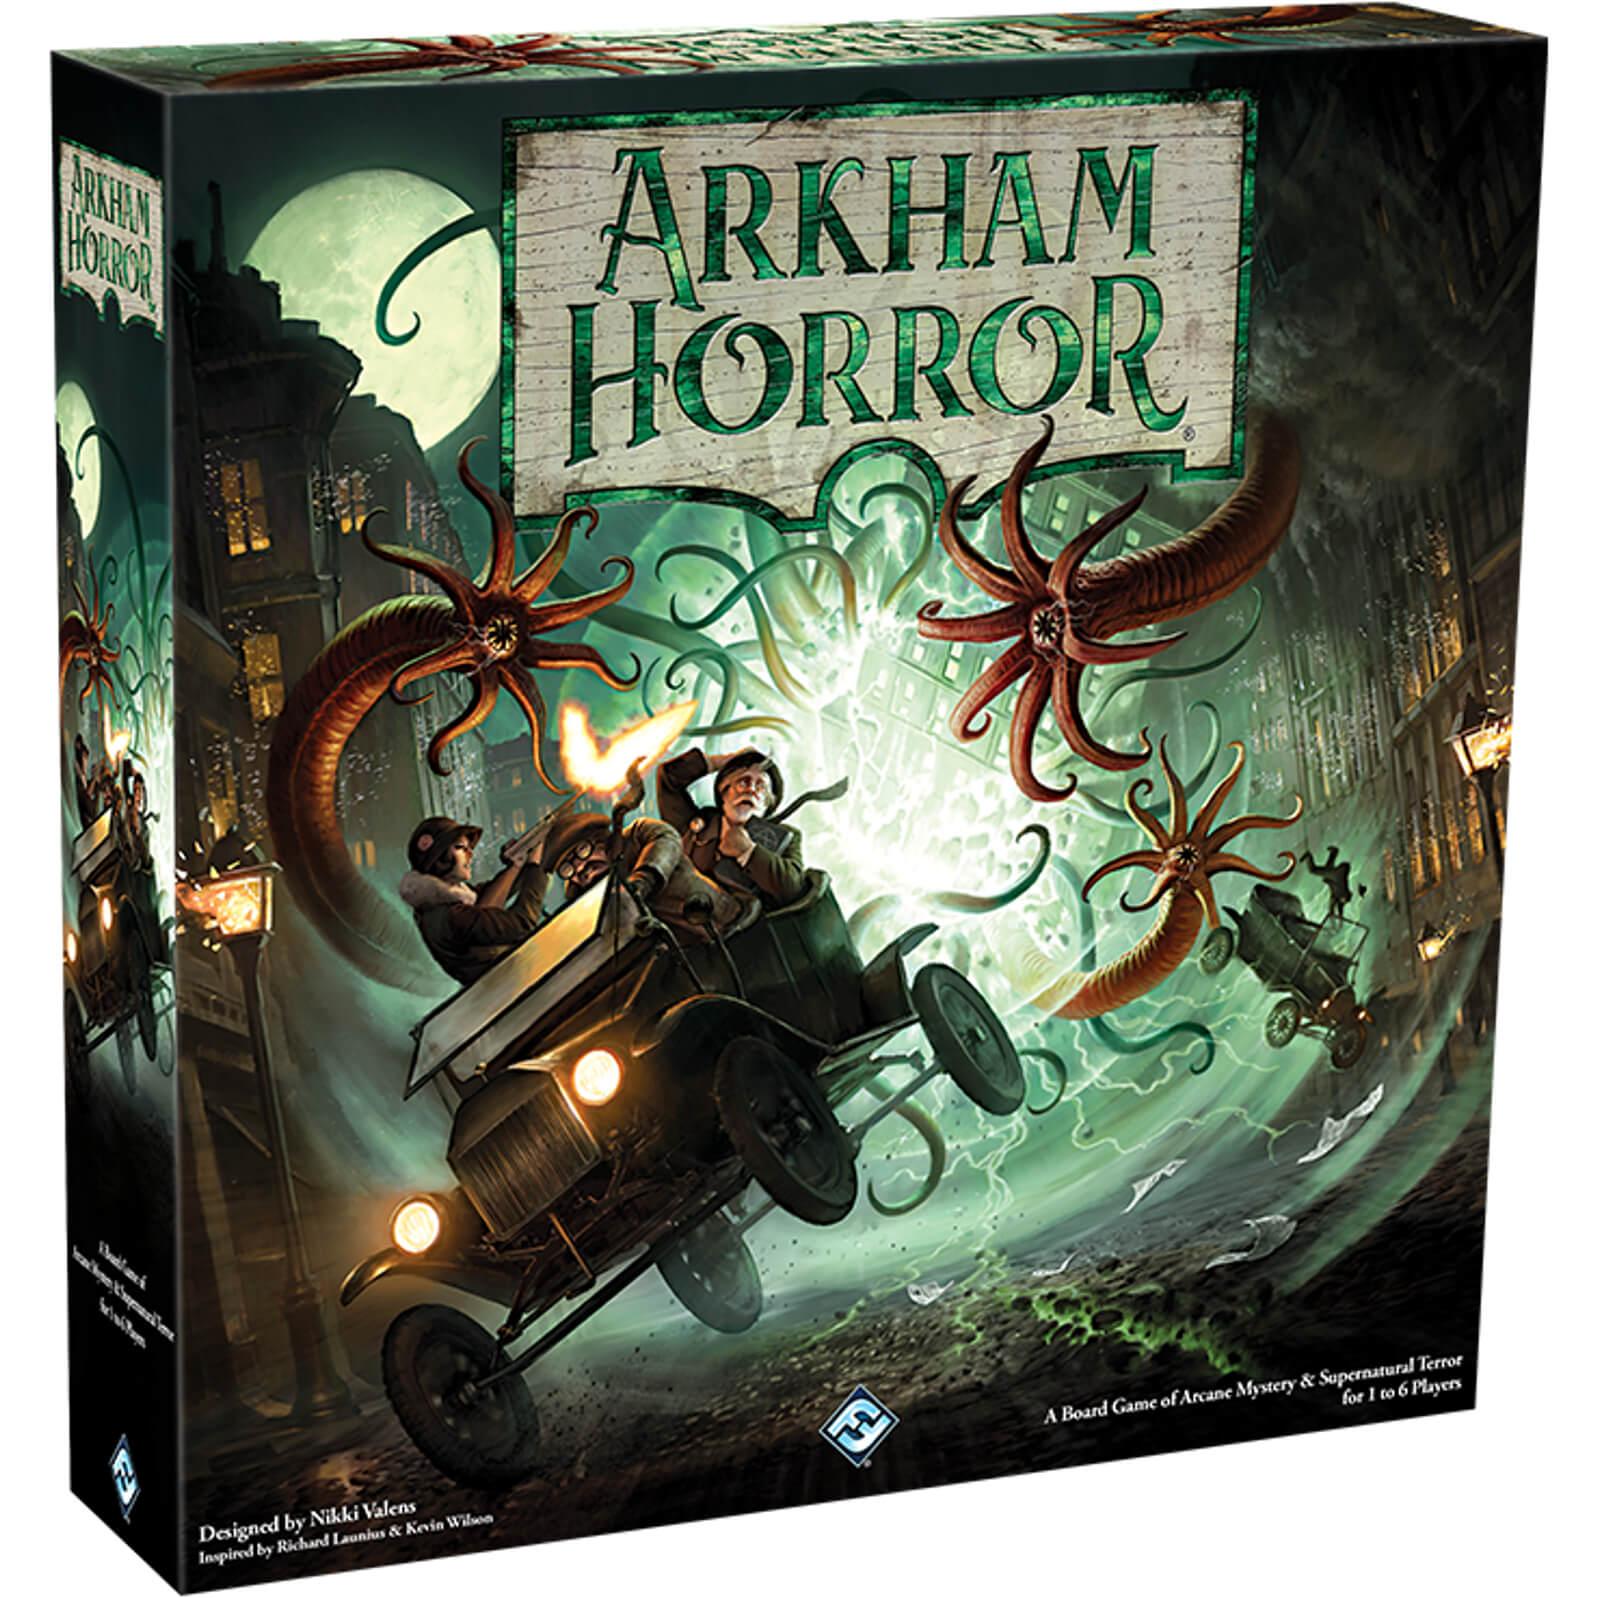 Image of Arkham Horror Third Edition